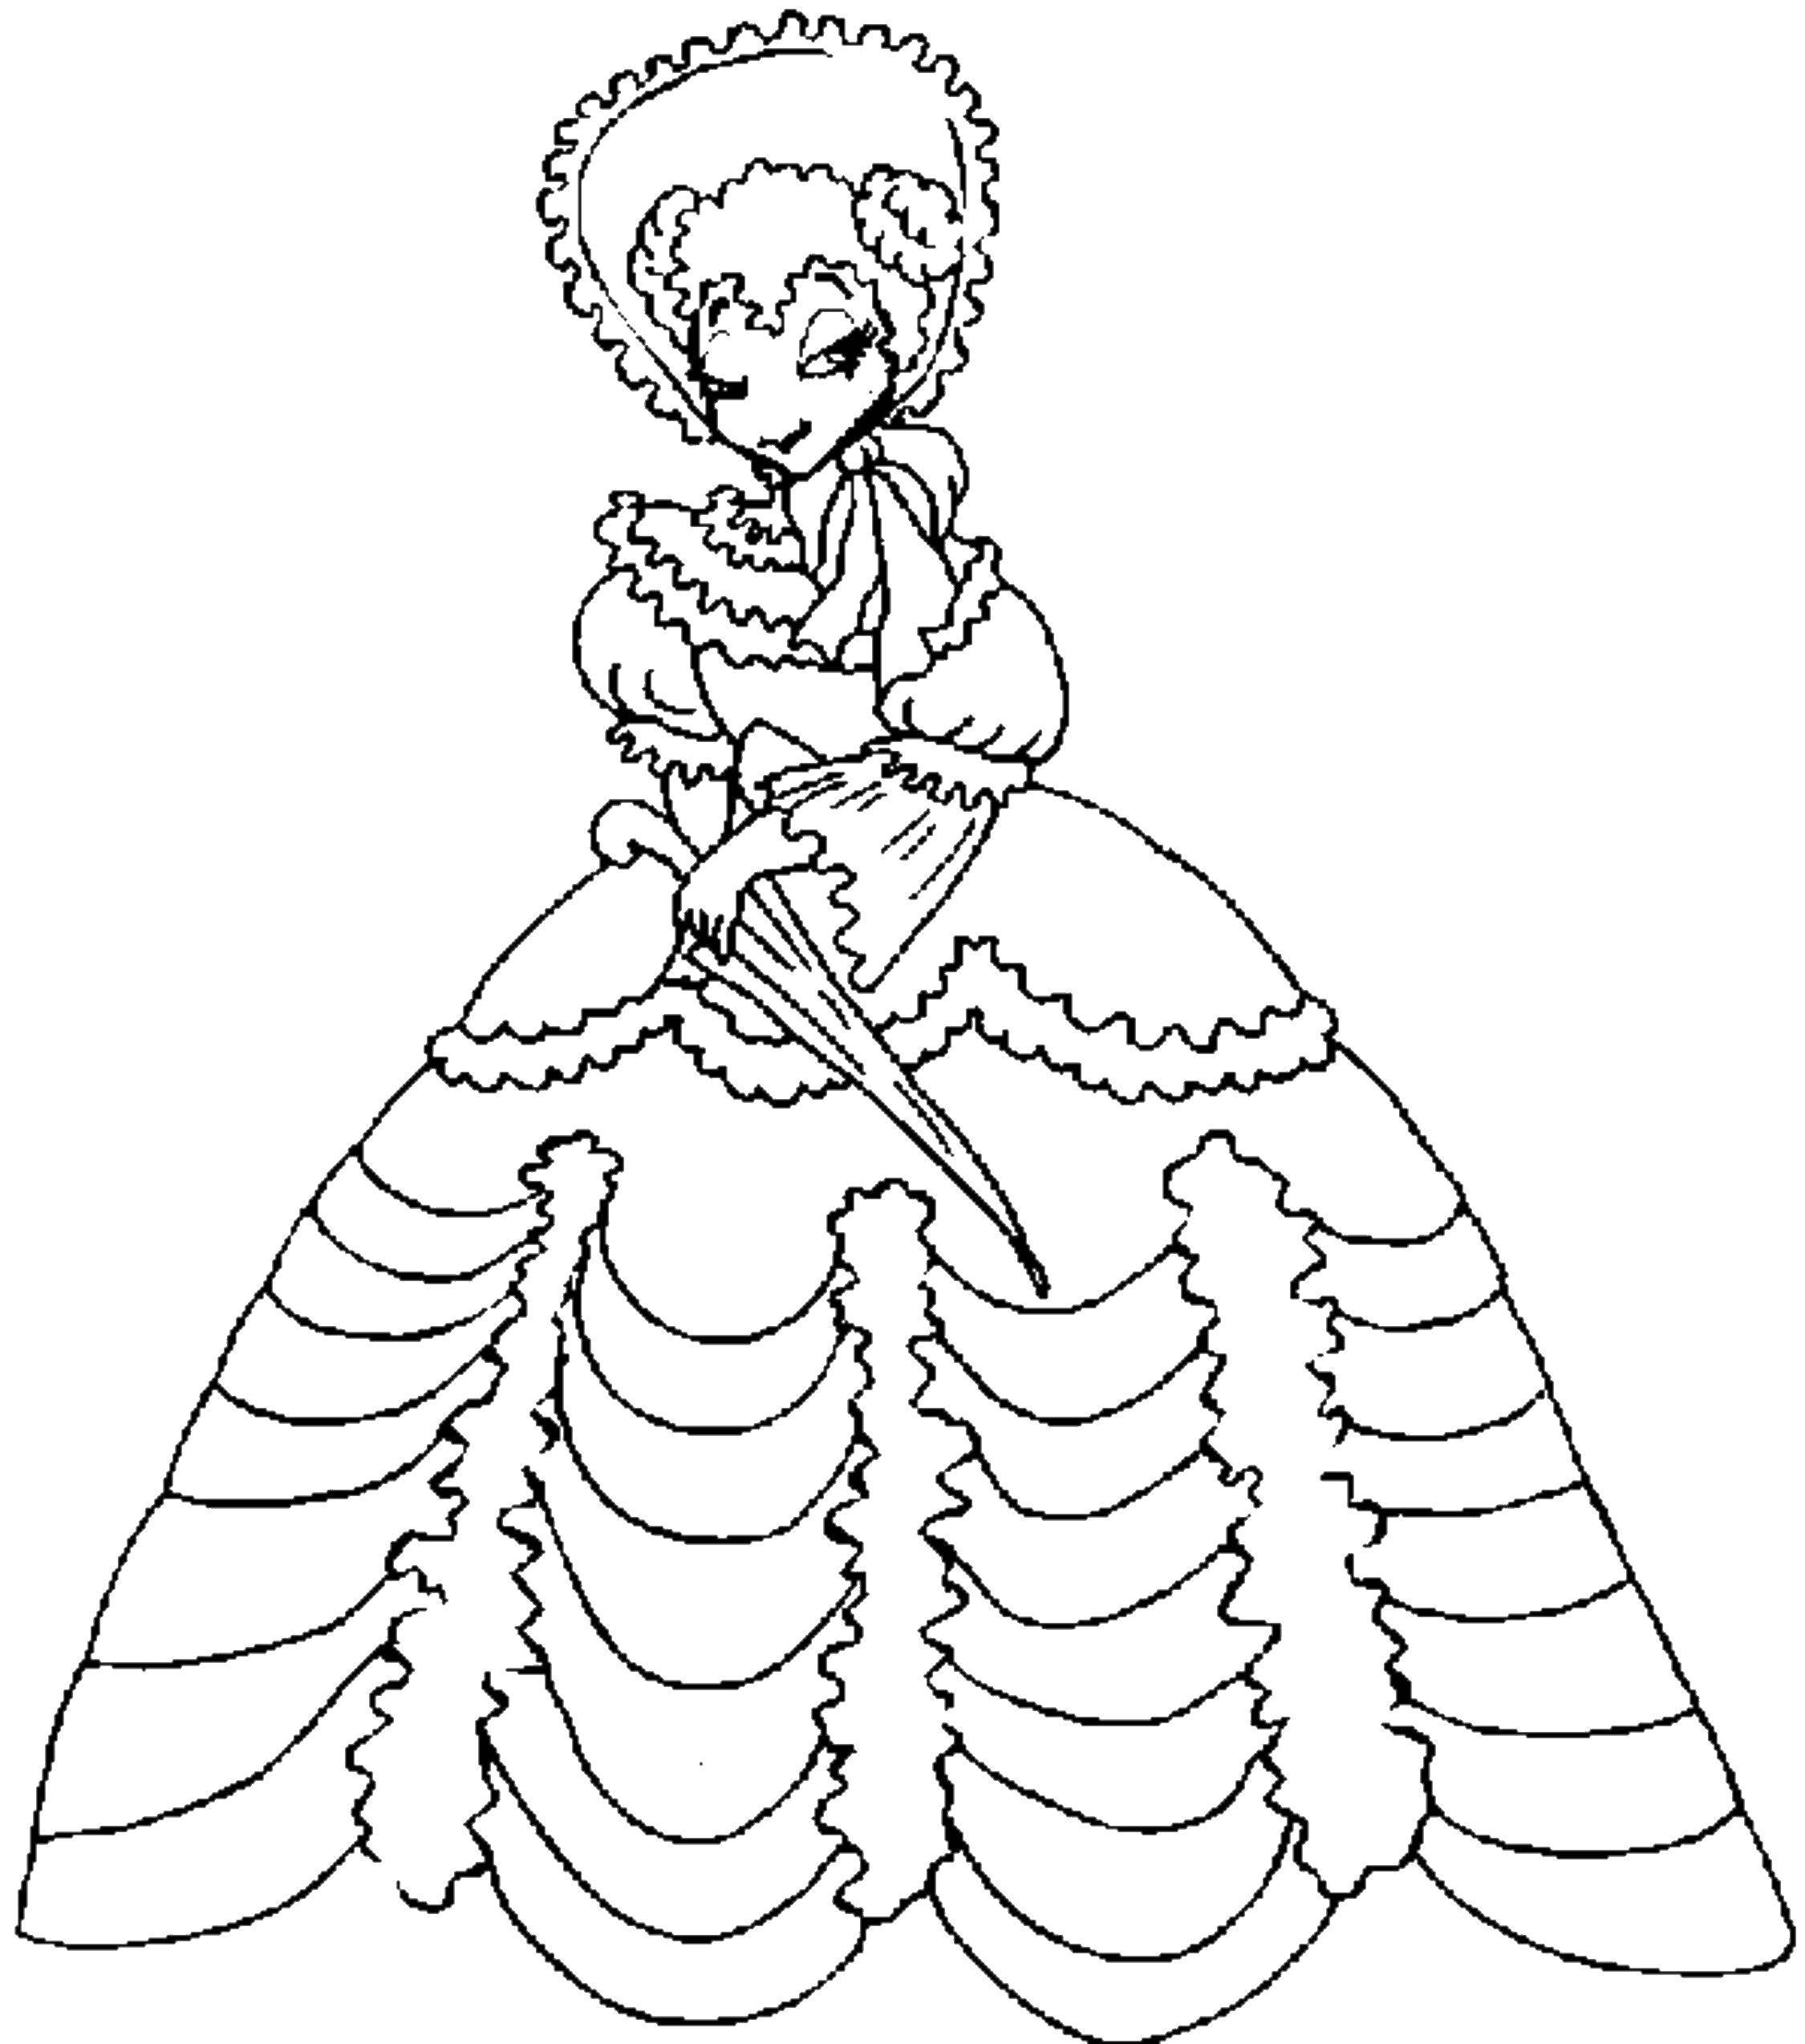 Coloring Ball gown. Download Princess dress.  Print